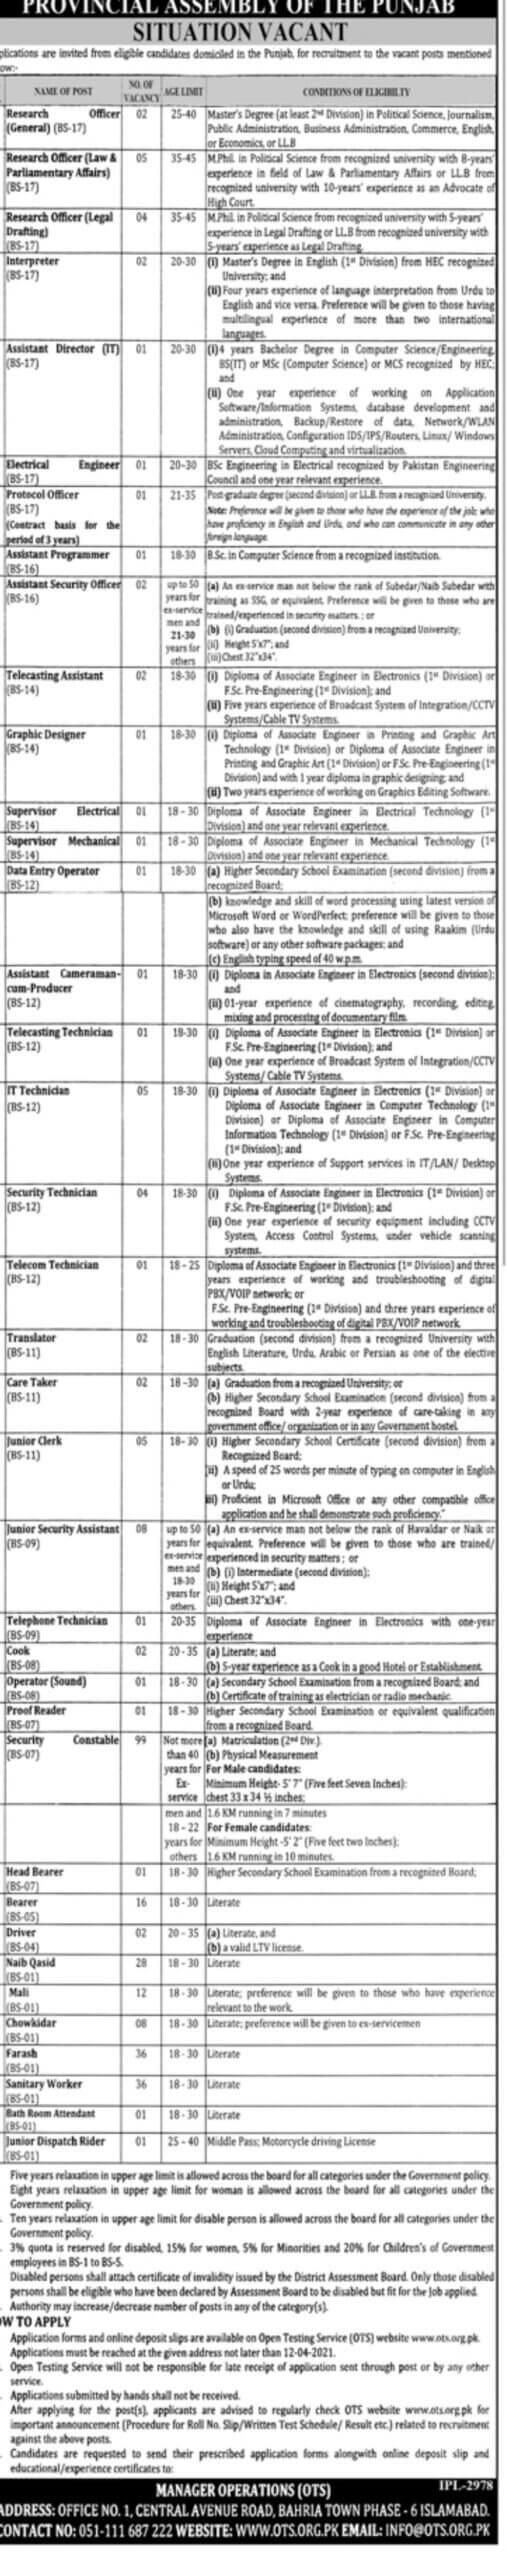 Punjab Assembly Jobs 2021 - Punjab Assembly Jobs 2021 Application Form - Punjab Assembly Jobs 2021 Advertisement